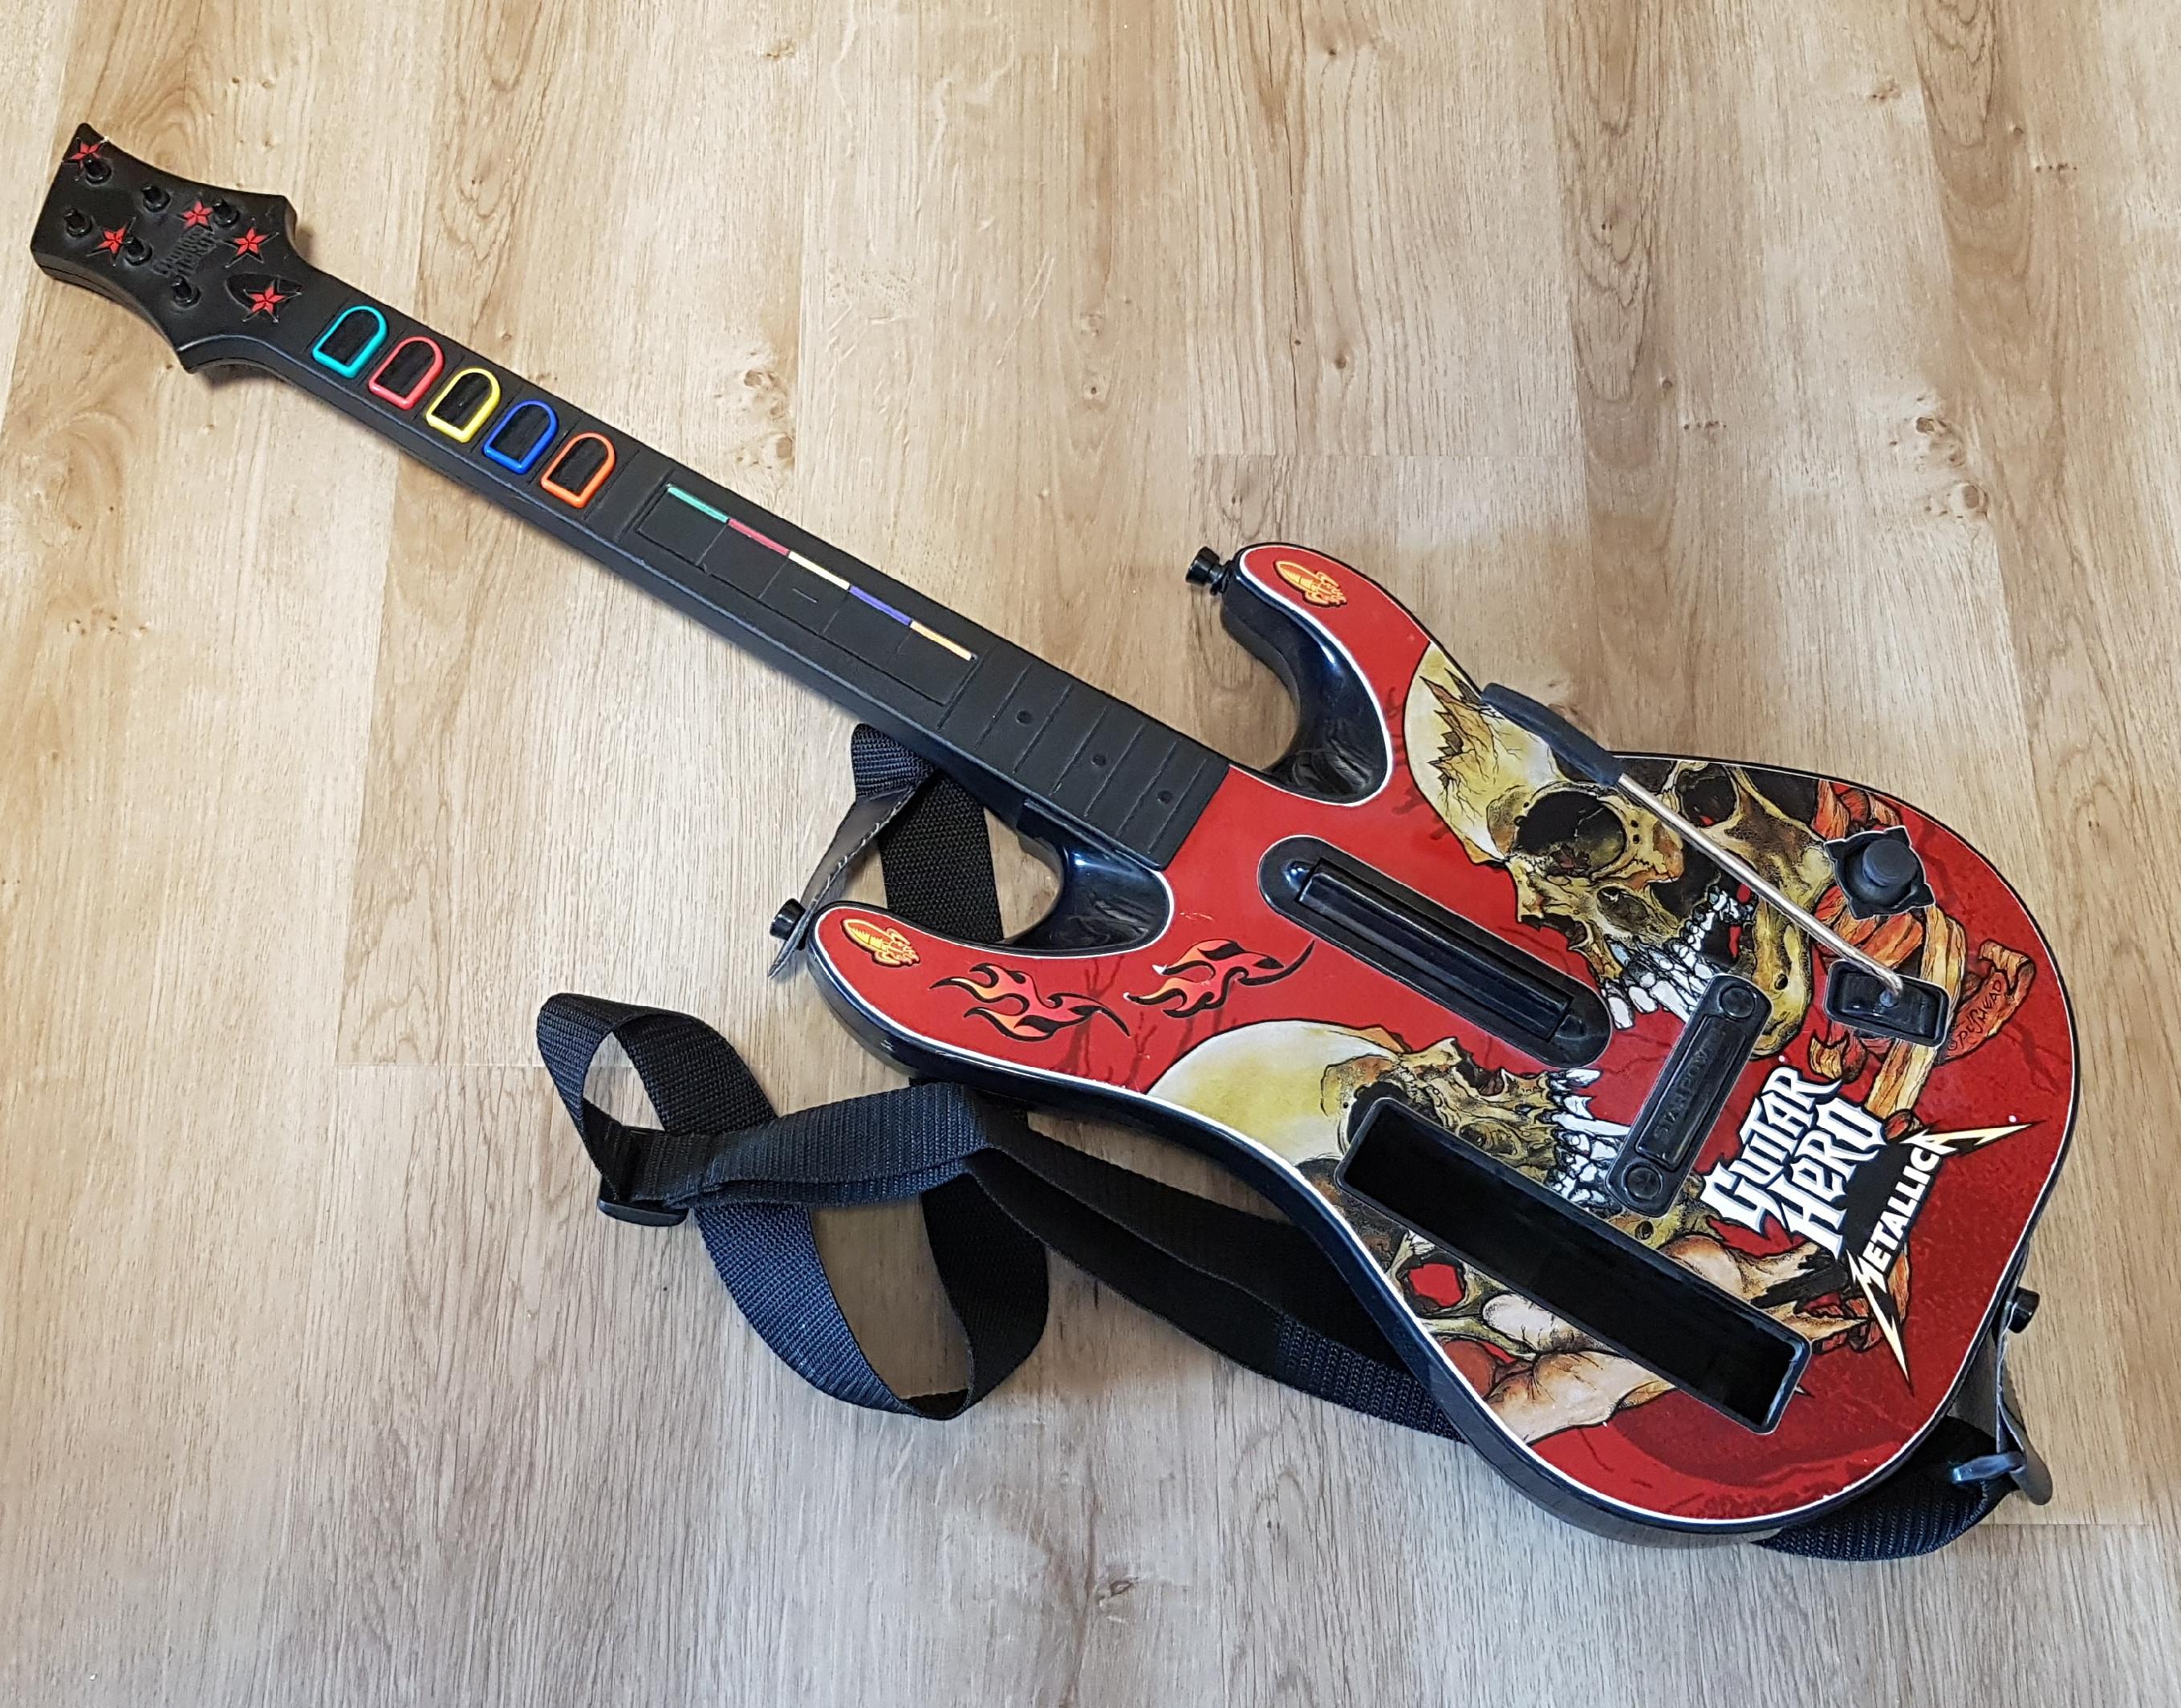 Wii Guitar Hero kytara